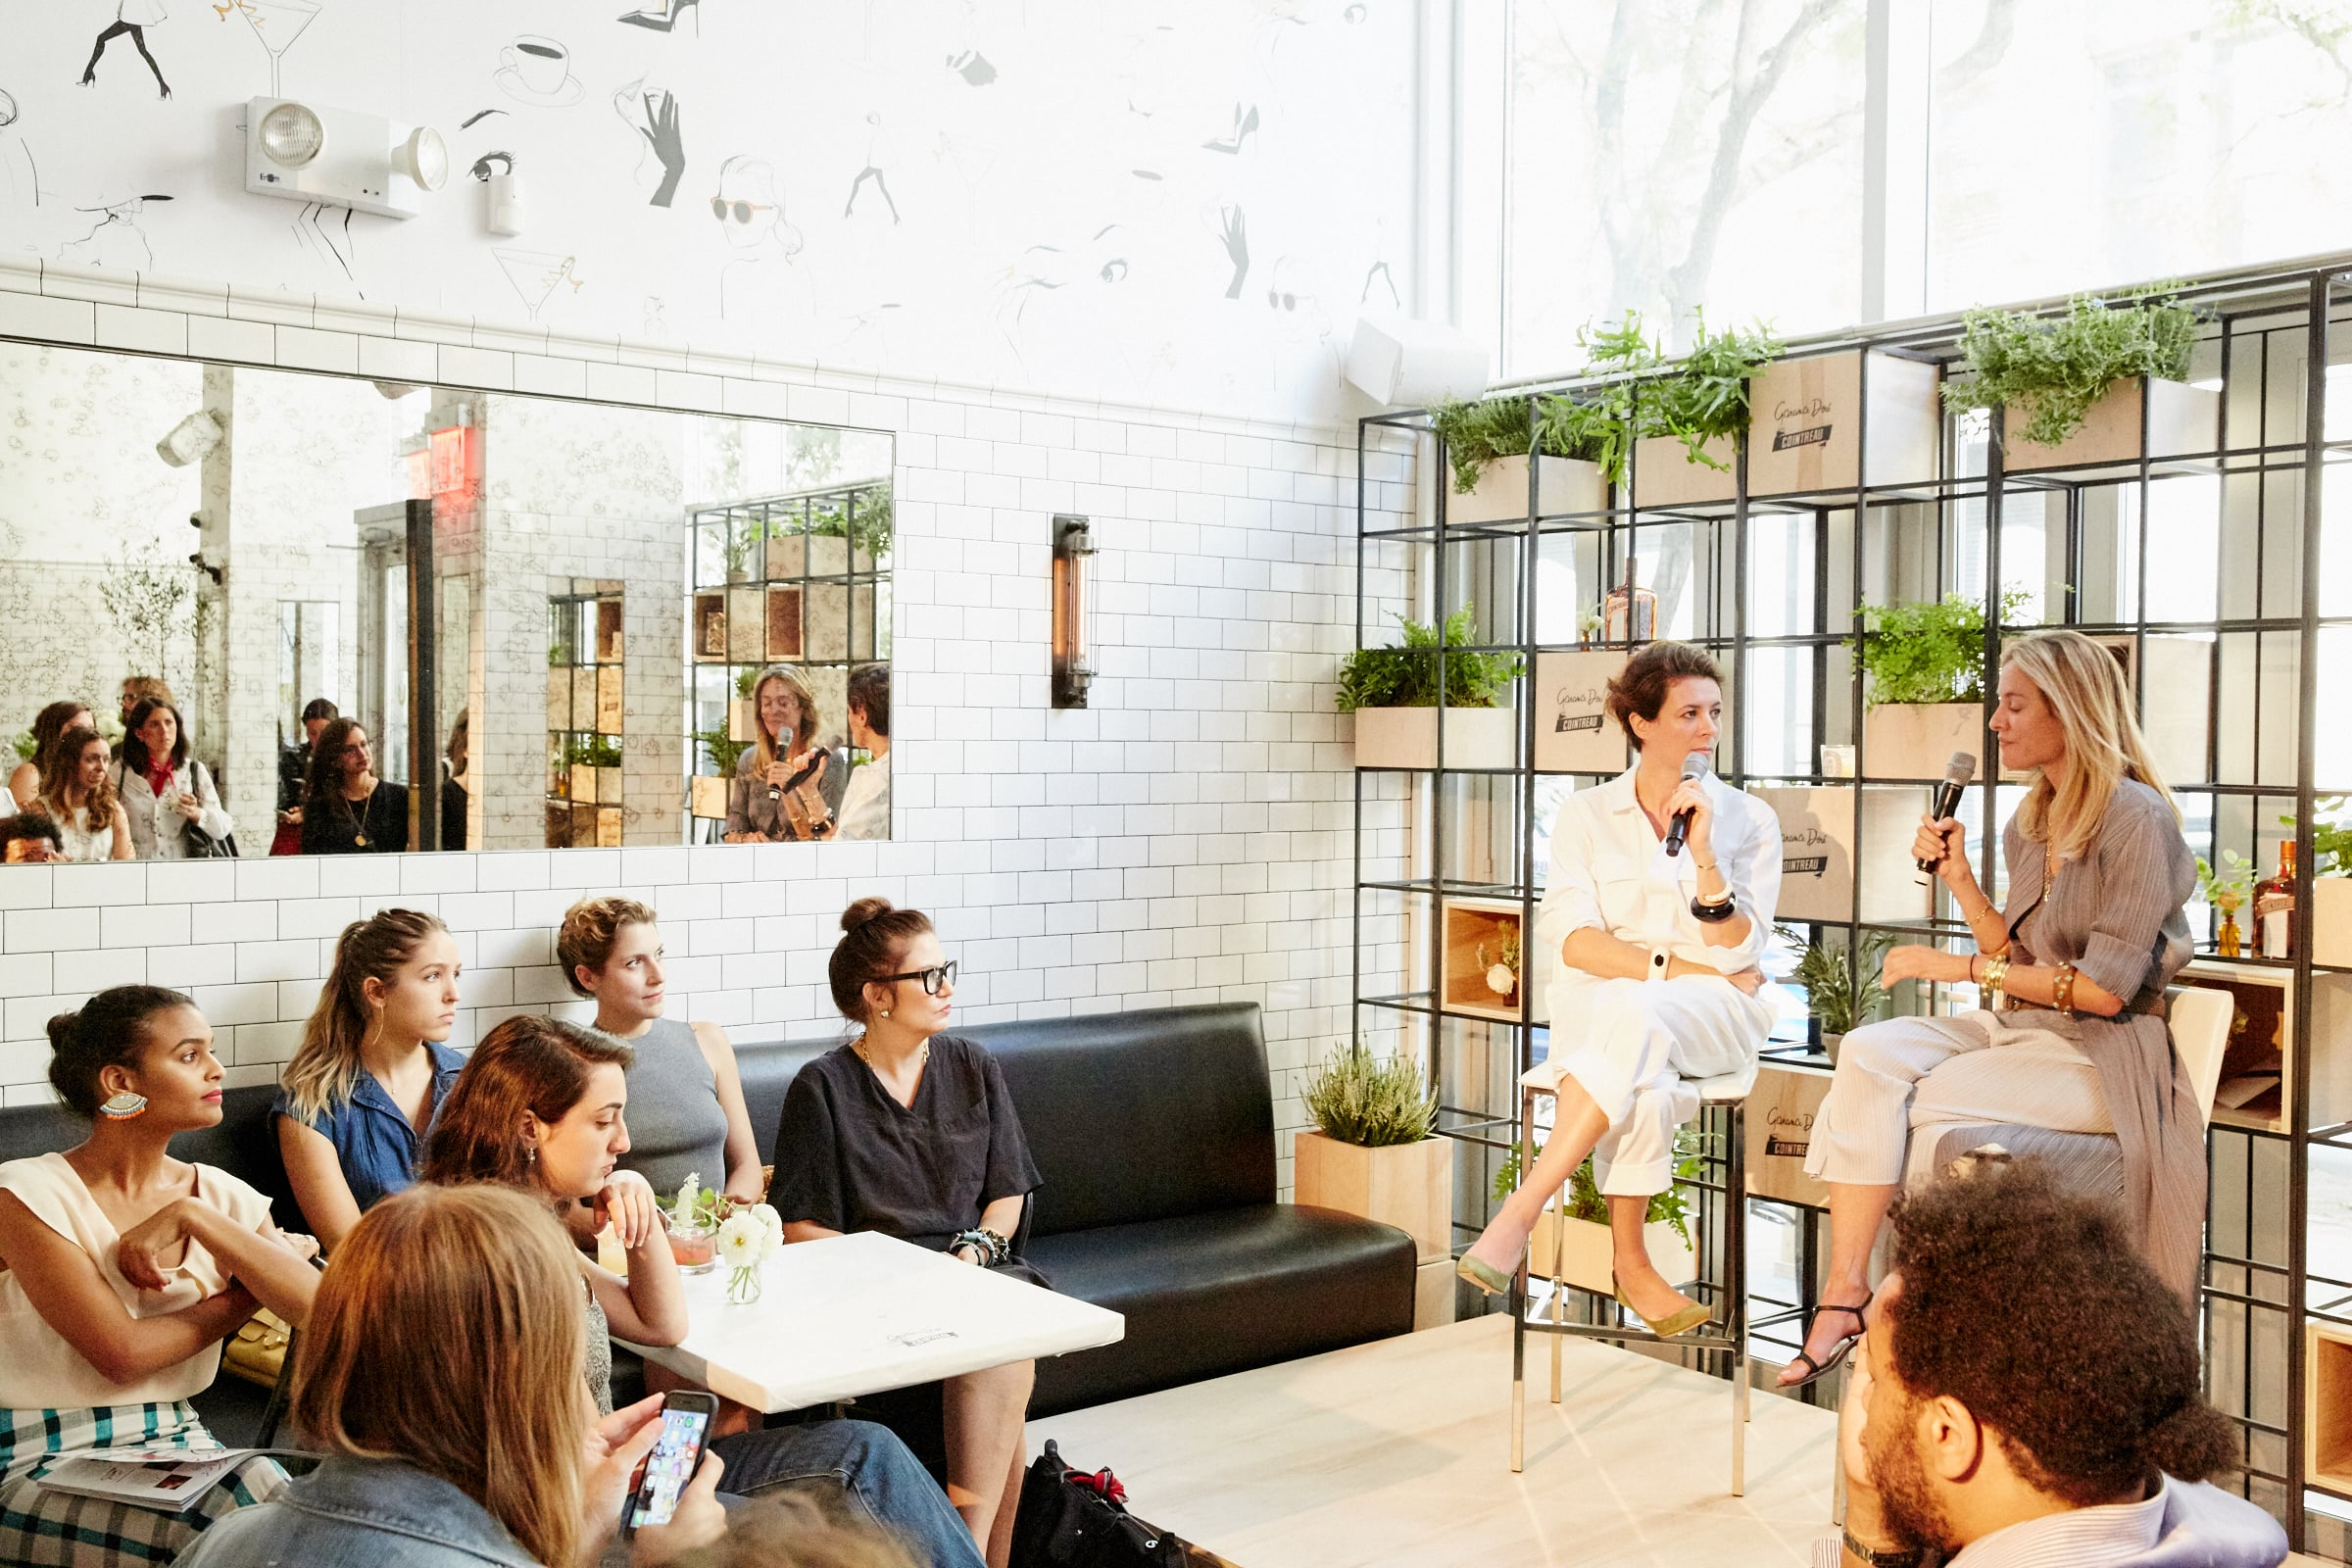 Cointreau's Garance Dore Pop Up for New York Fashion Week